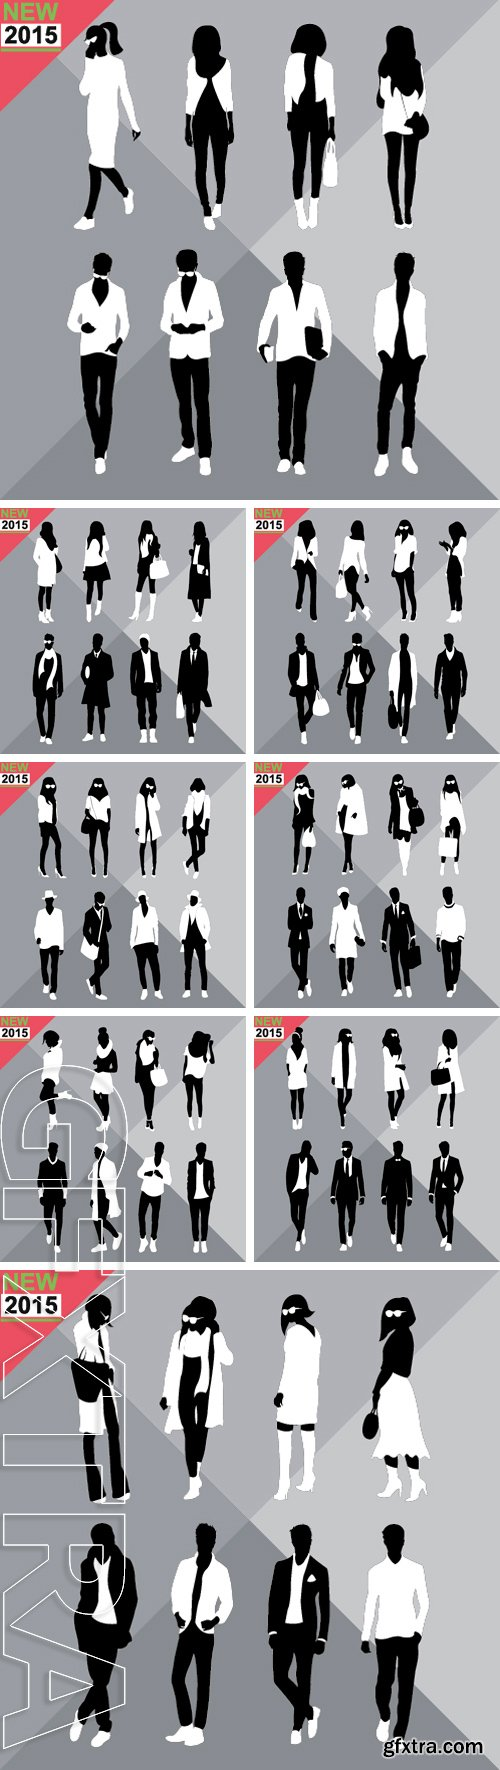 Stock Vectors - Set of men and women black silhouettes, editable